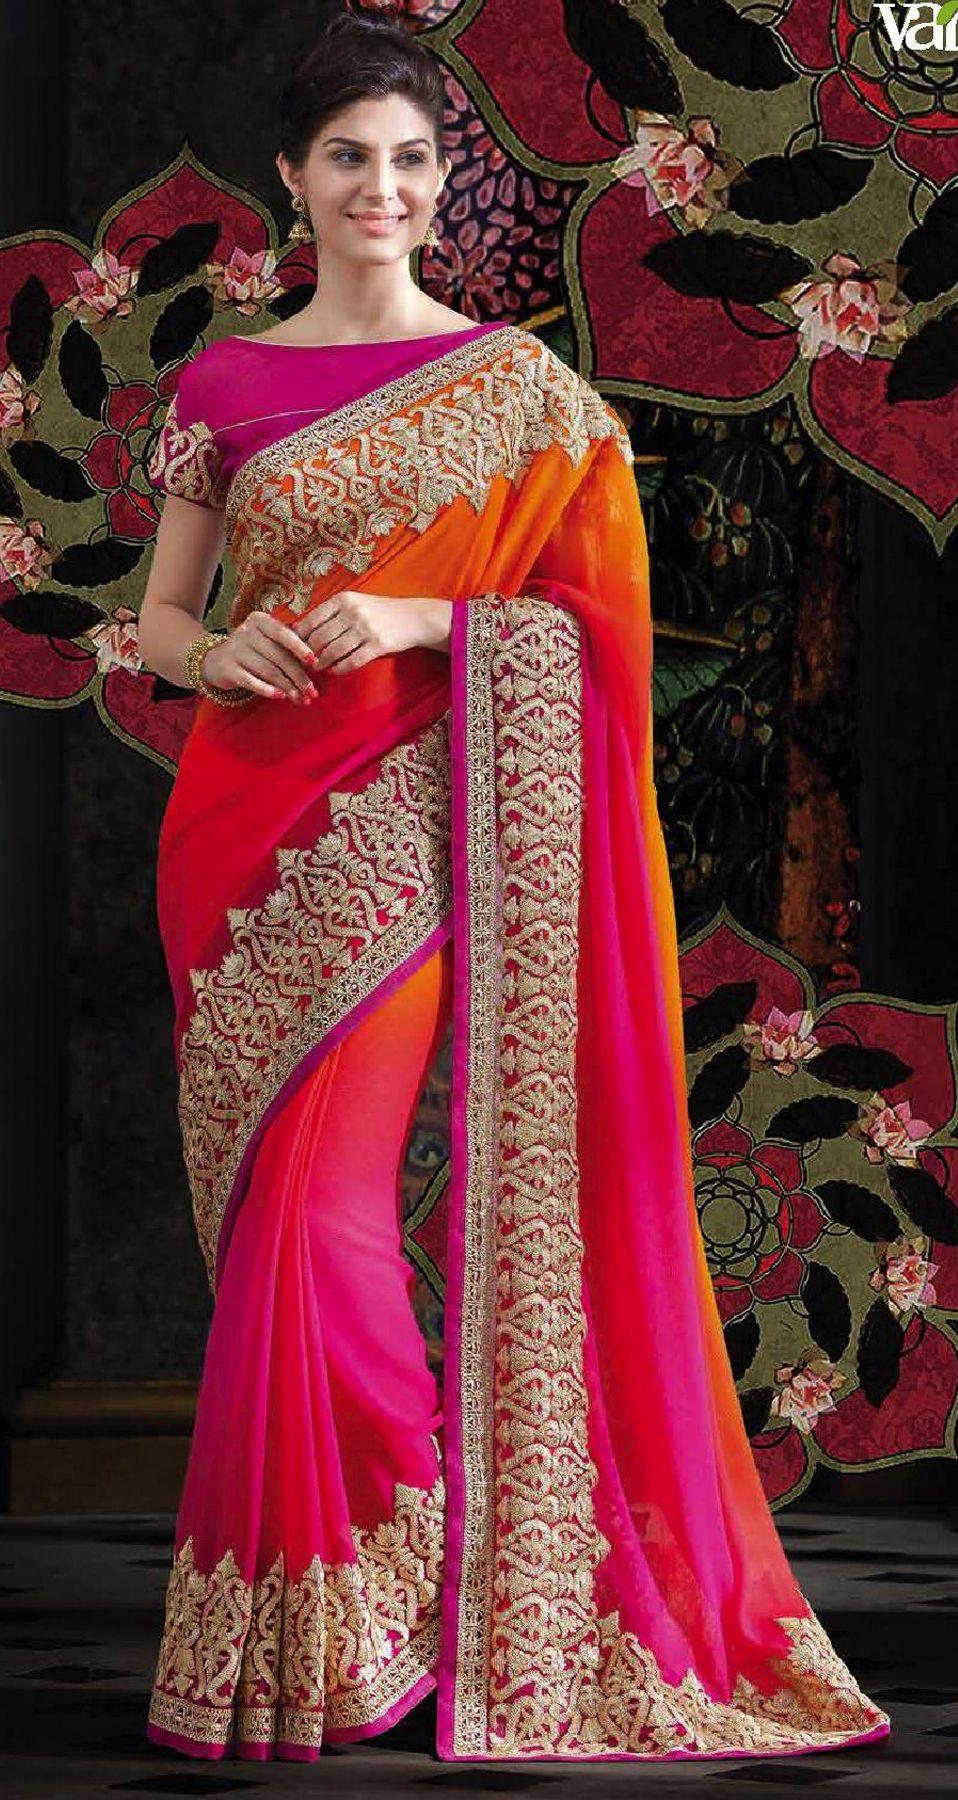 Designer Red Resham Zari Embroidery Bollywood Sari Georgette Wedding Wear Saree